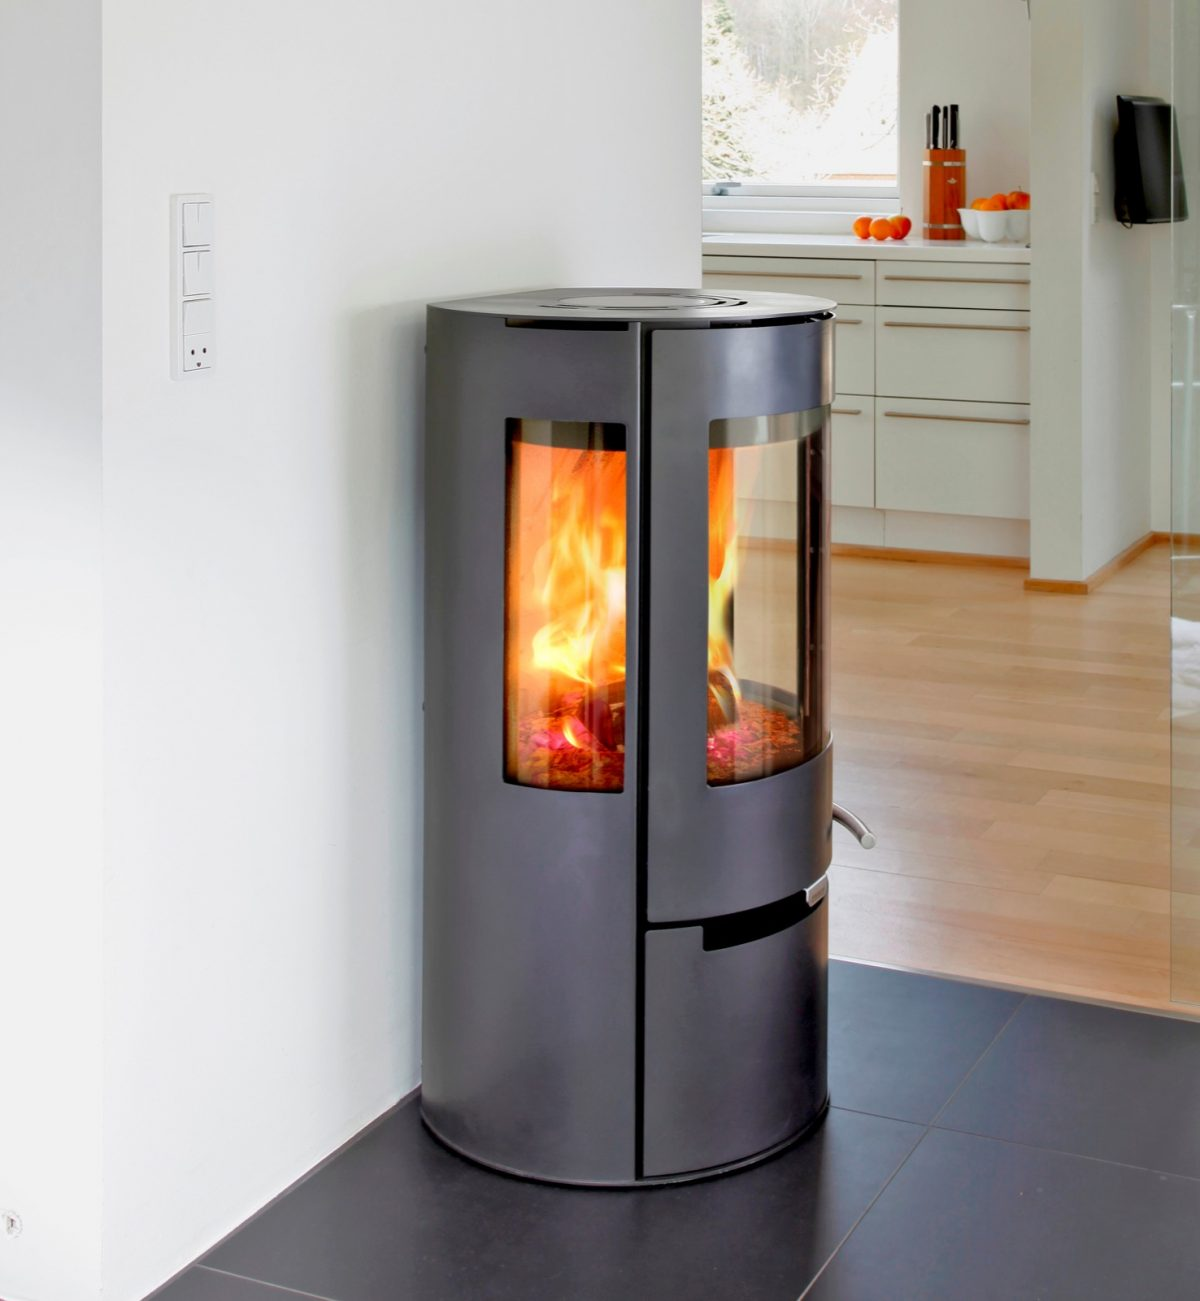 ADURO 9 Defra approved Wood Burning Stove